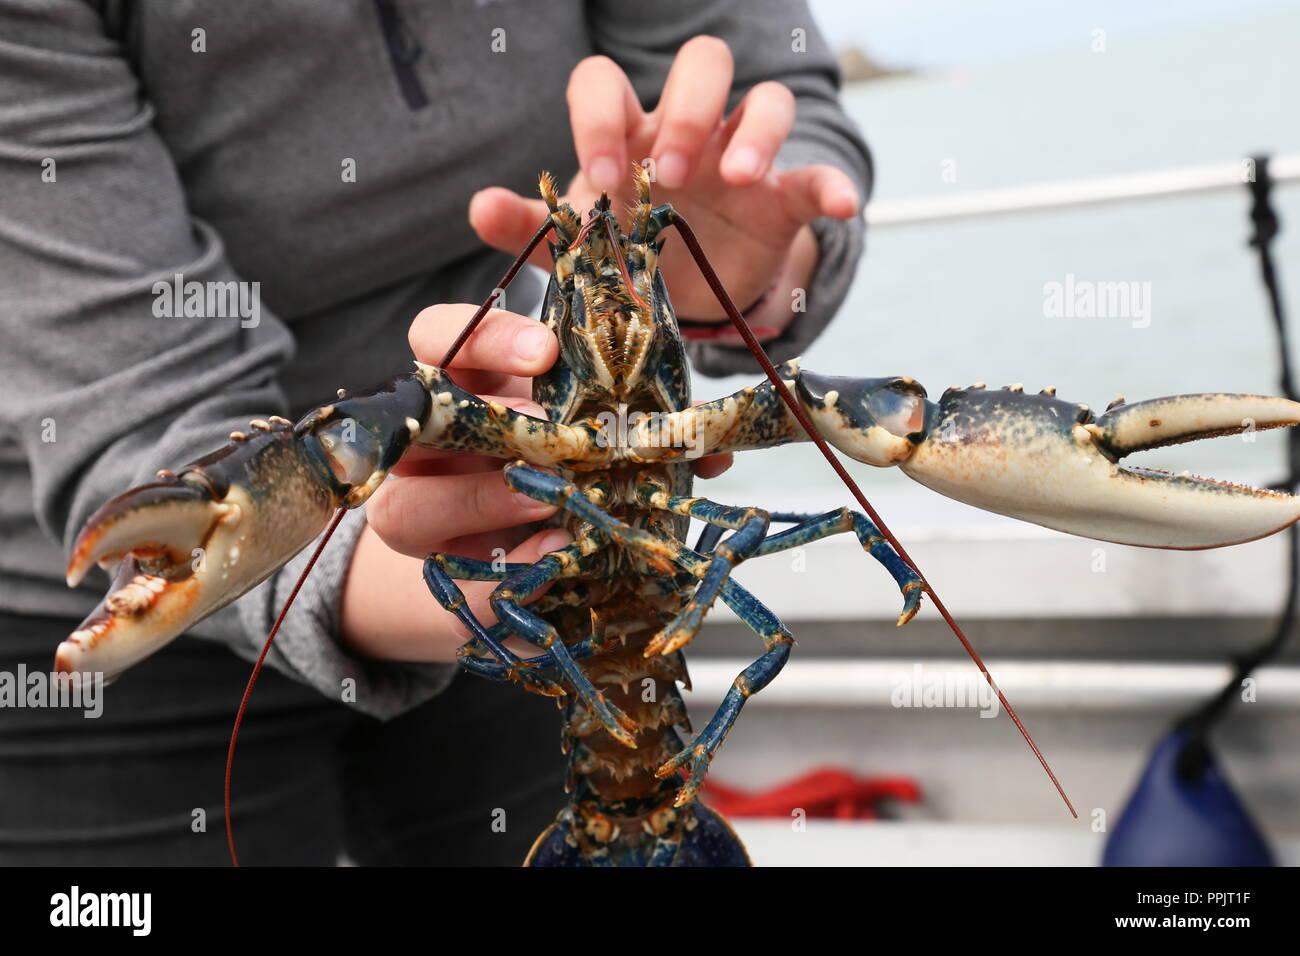 European Lobster (Homarus gammarus), Wildlife Boat Trip, New Quay, Cardigan Bay, Ceredigion, Wales, Great Britain, United Kingdom, UK, Europe - Stock Image